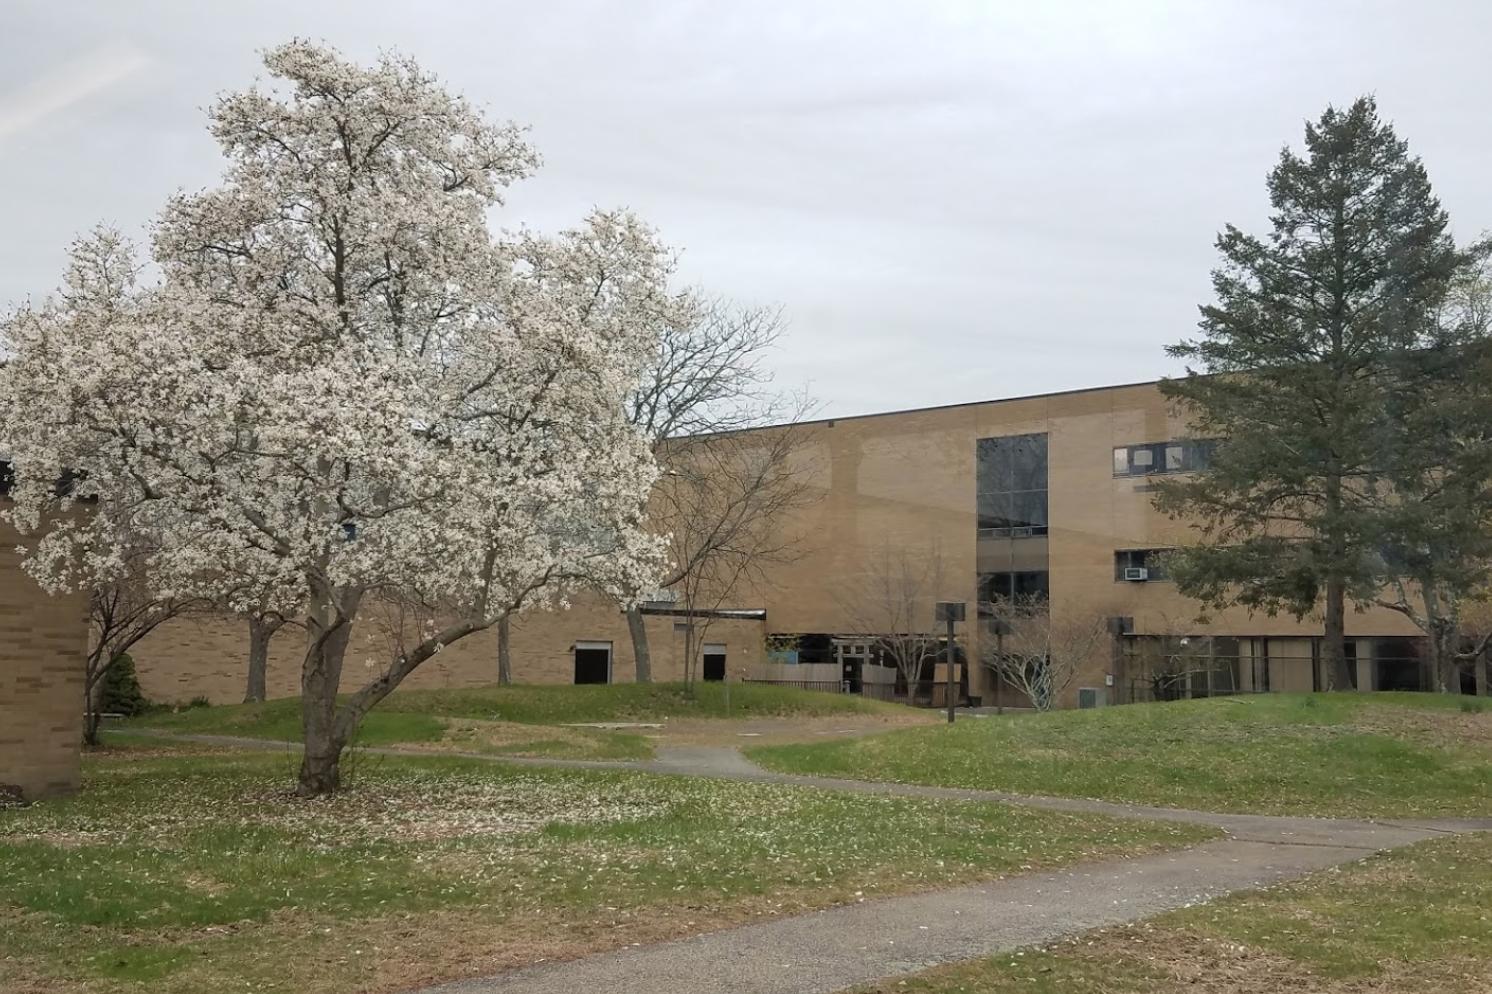 LOCAL. Attleboro High School, MA